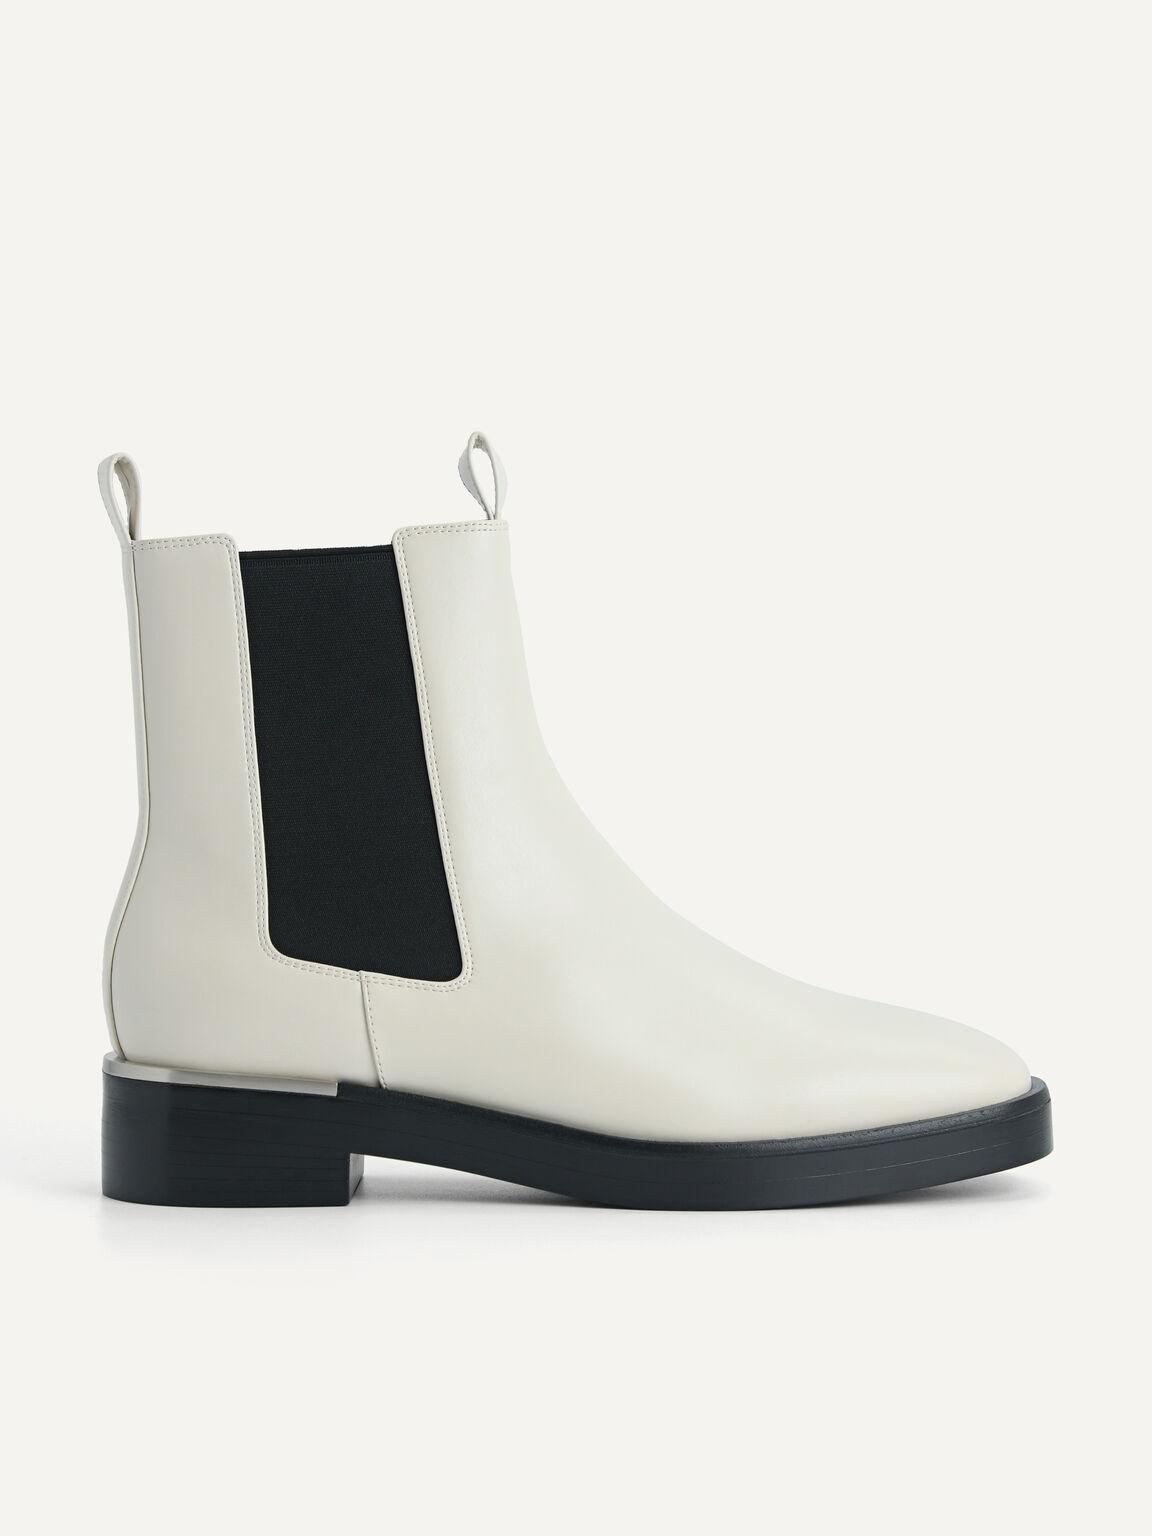 Chelsea Boots, Chalk, hi-res